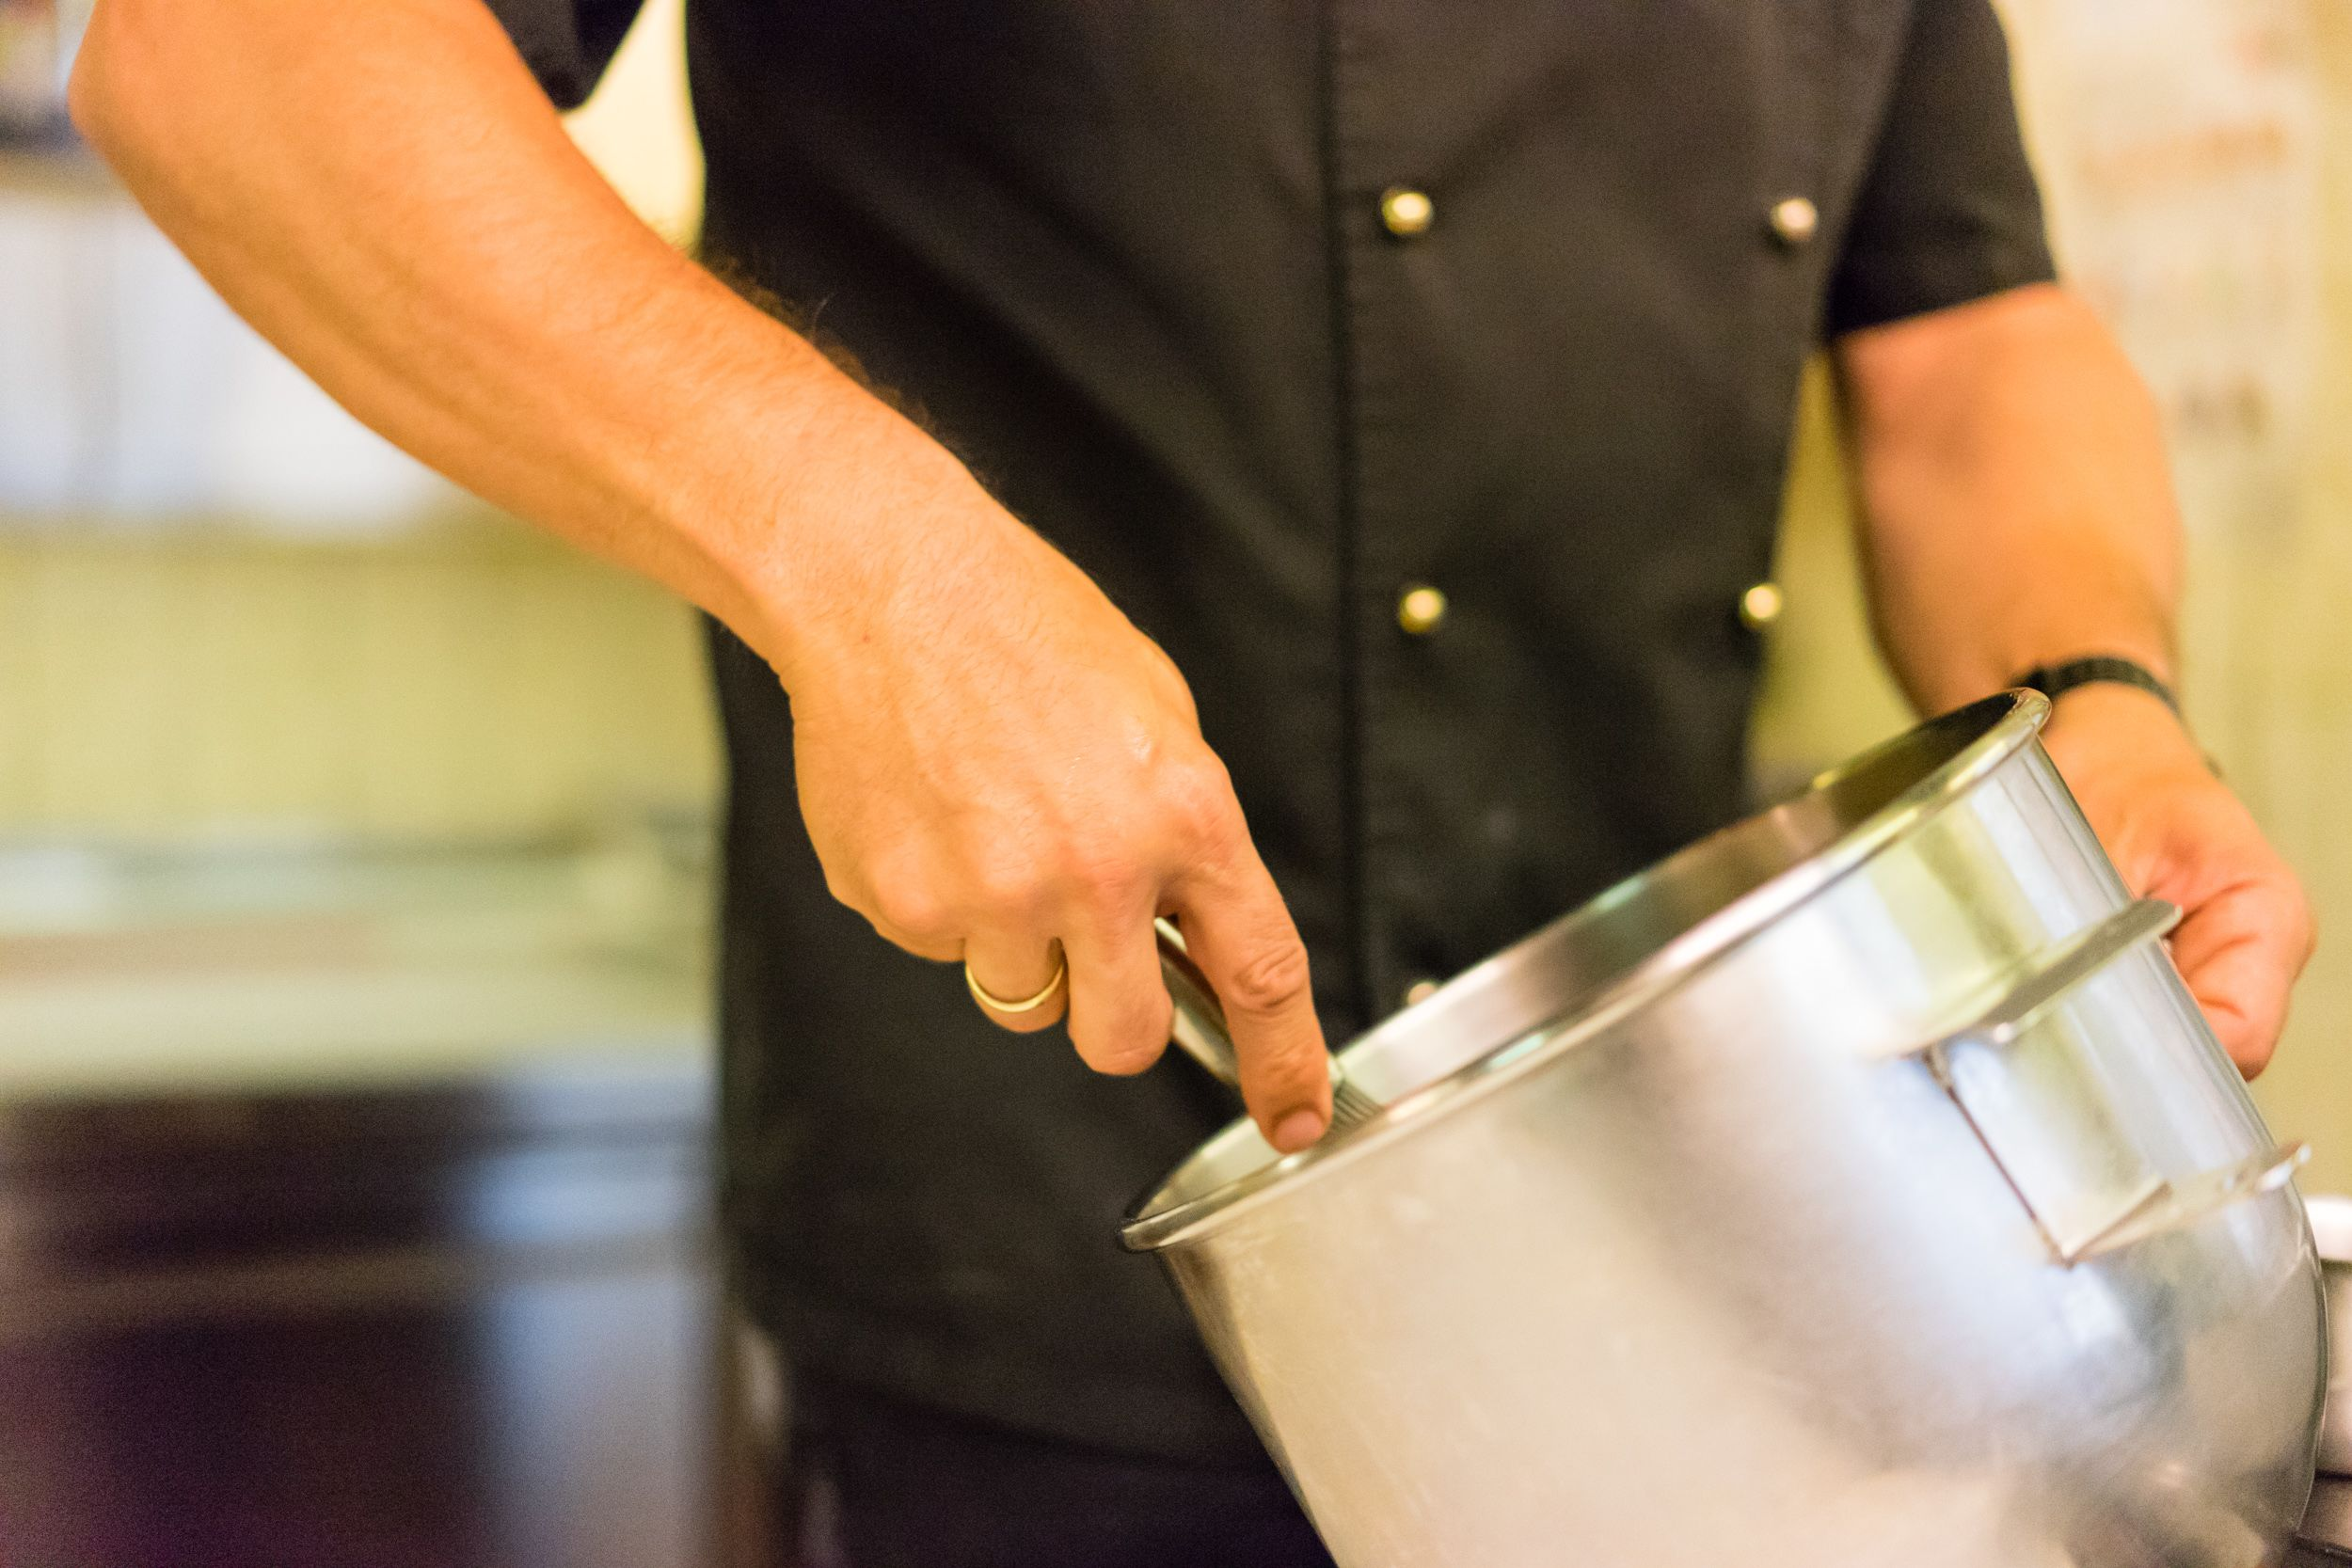 regionale Küche im Vital-Hotel Post